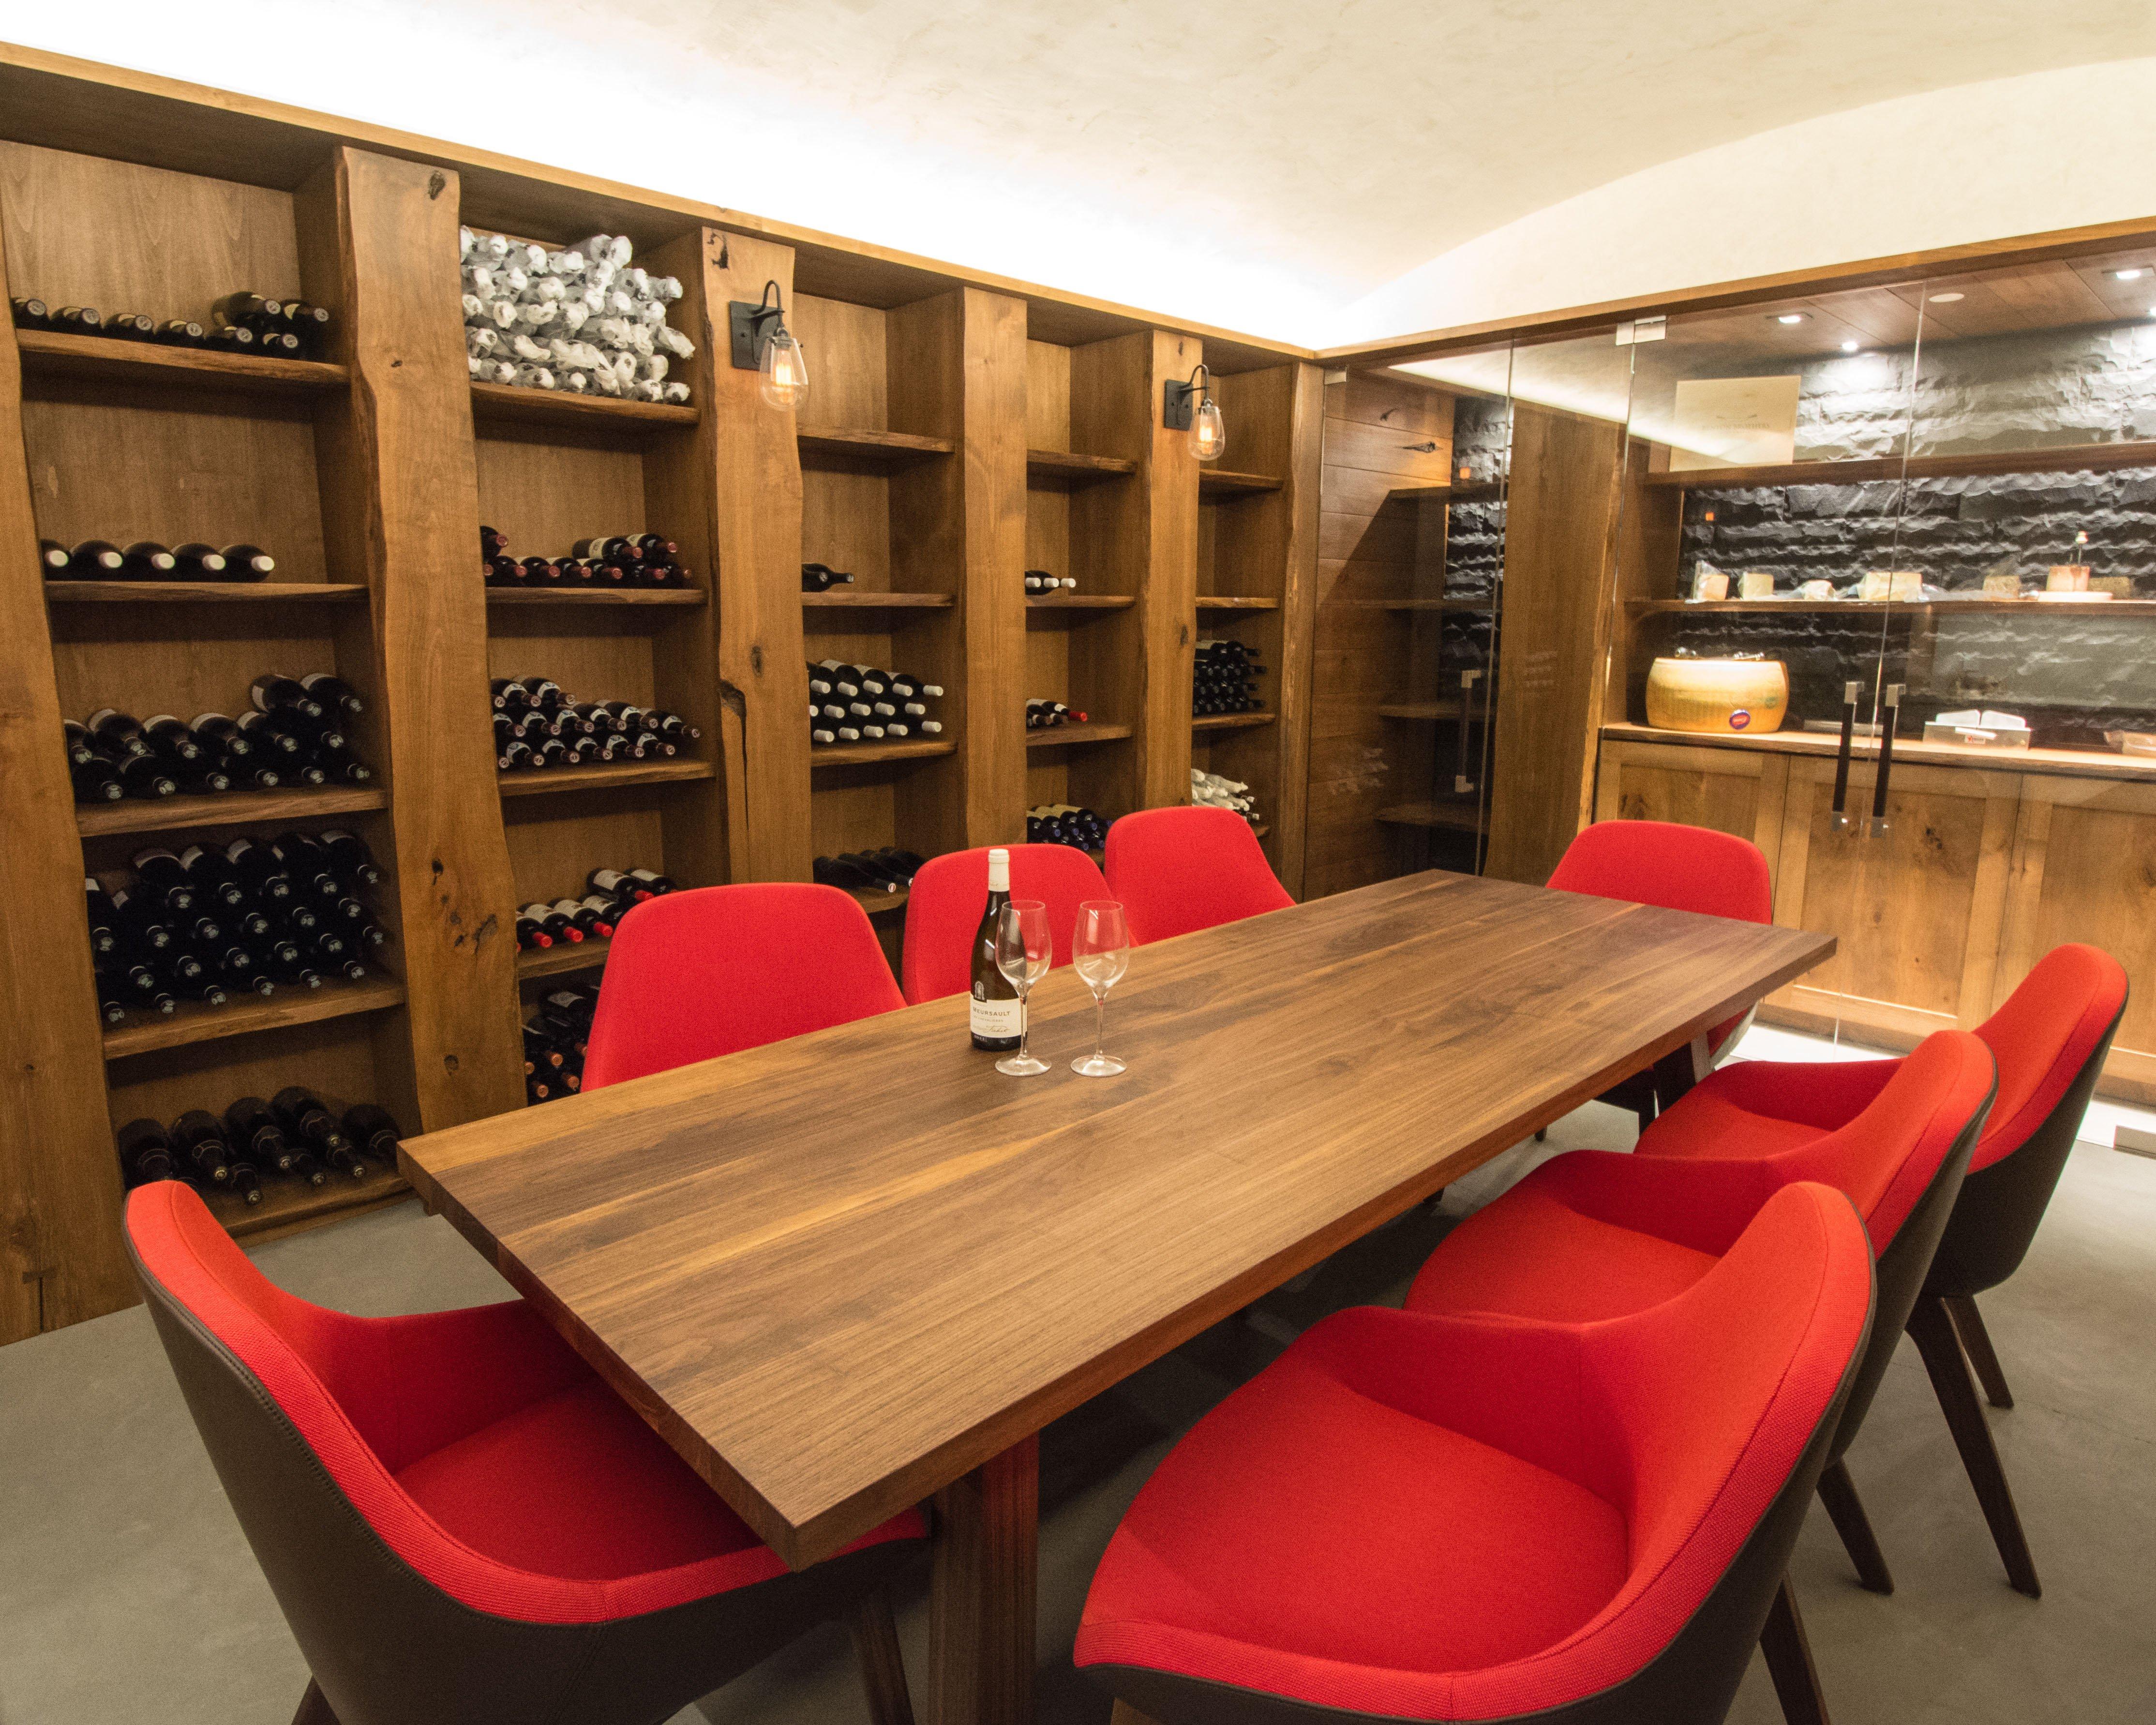 15 - Wine cellar EDITED